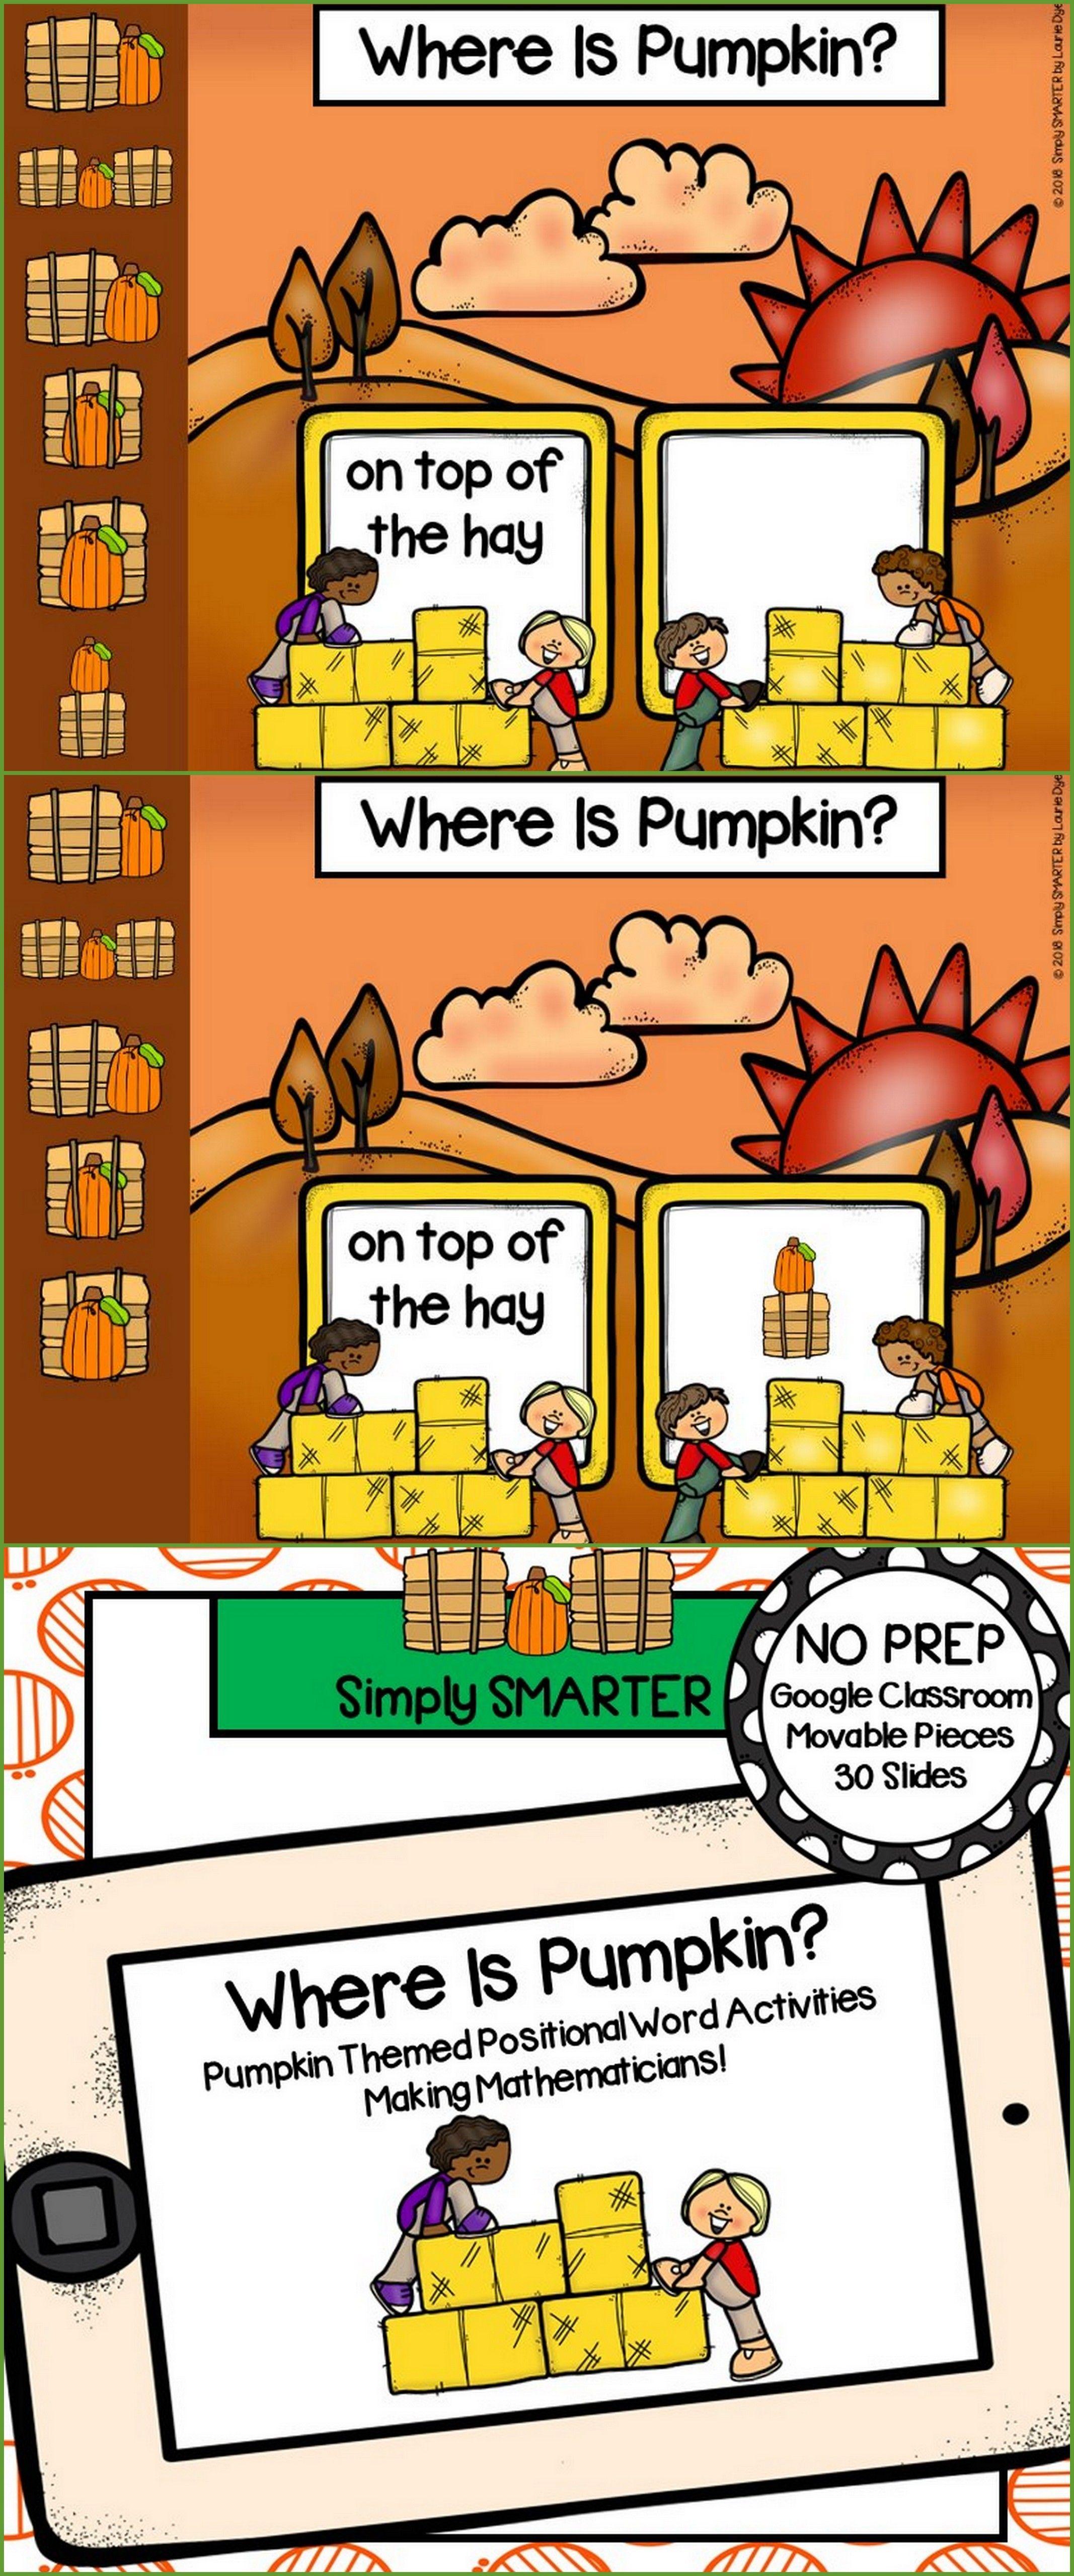 Pumpkin Themed Positional Word Activities For